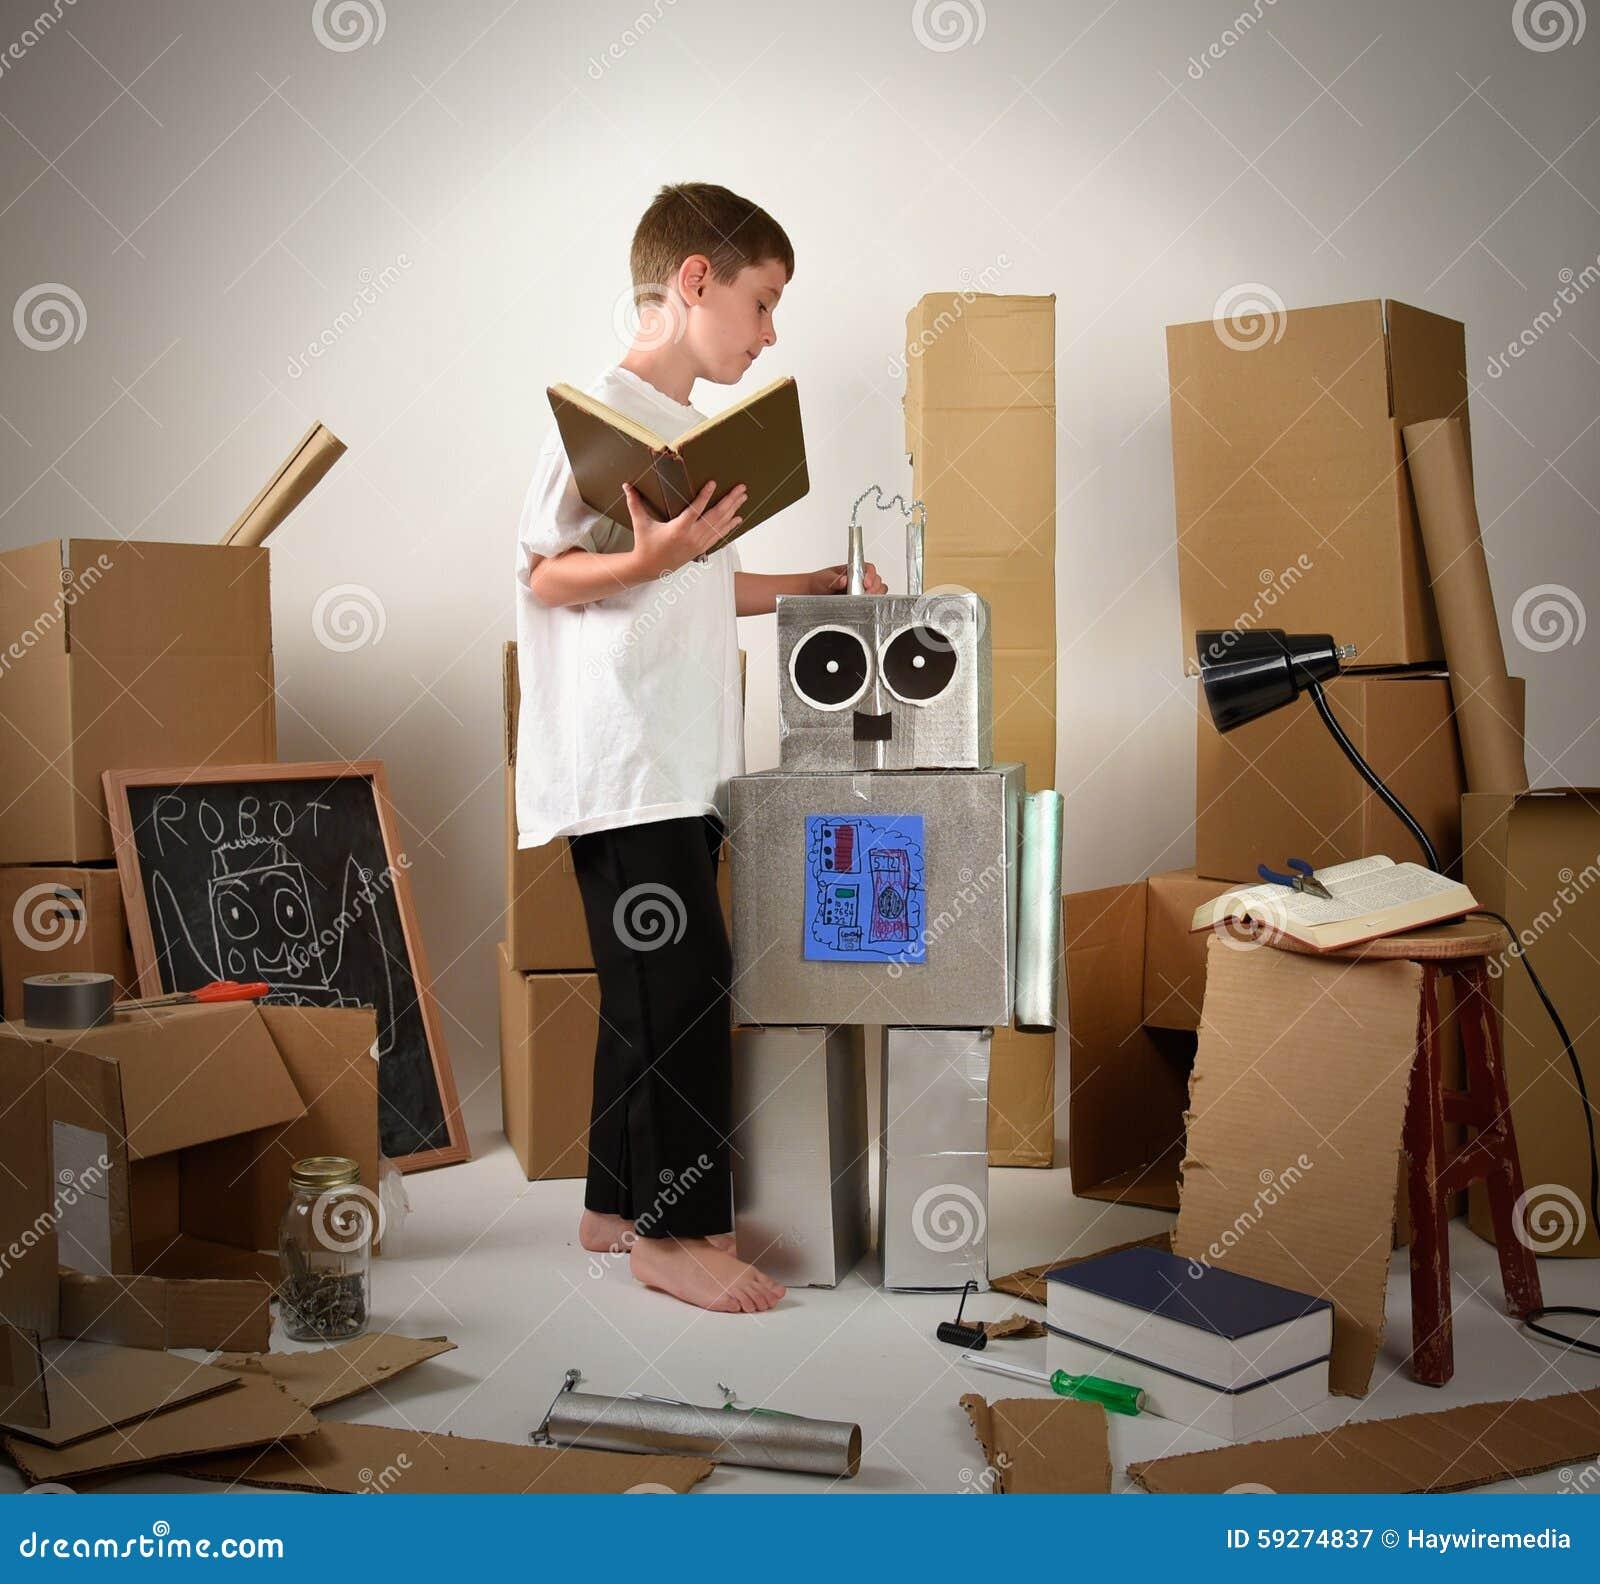 bo cardboard robot reading - photo #7